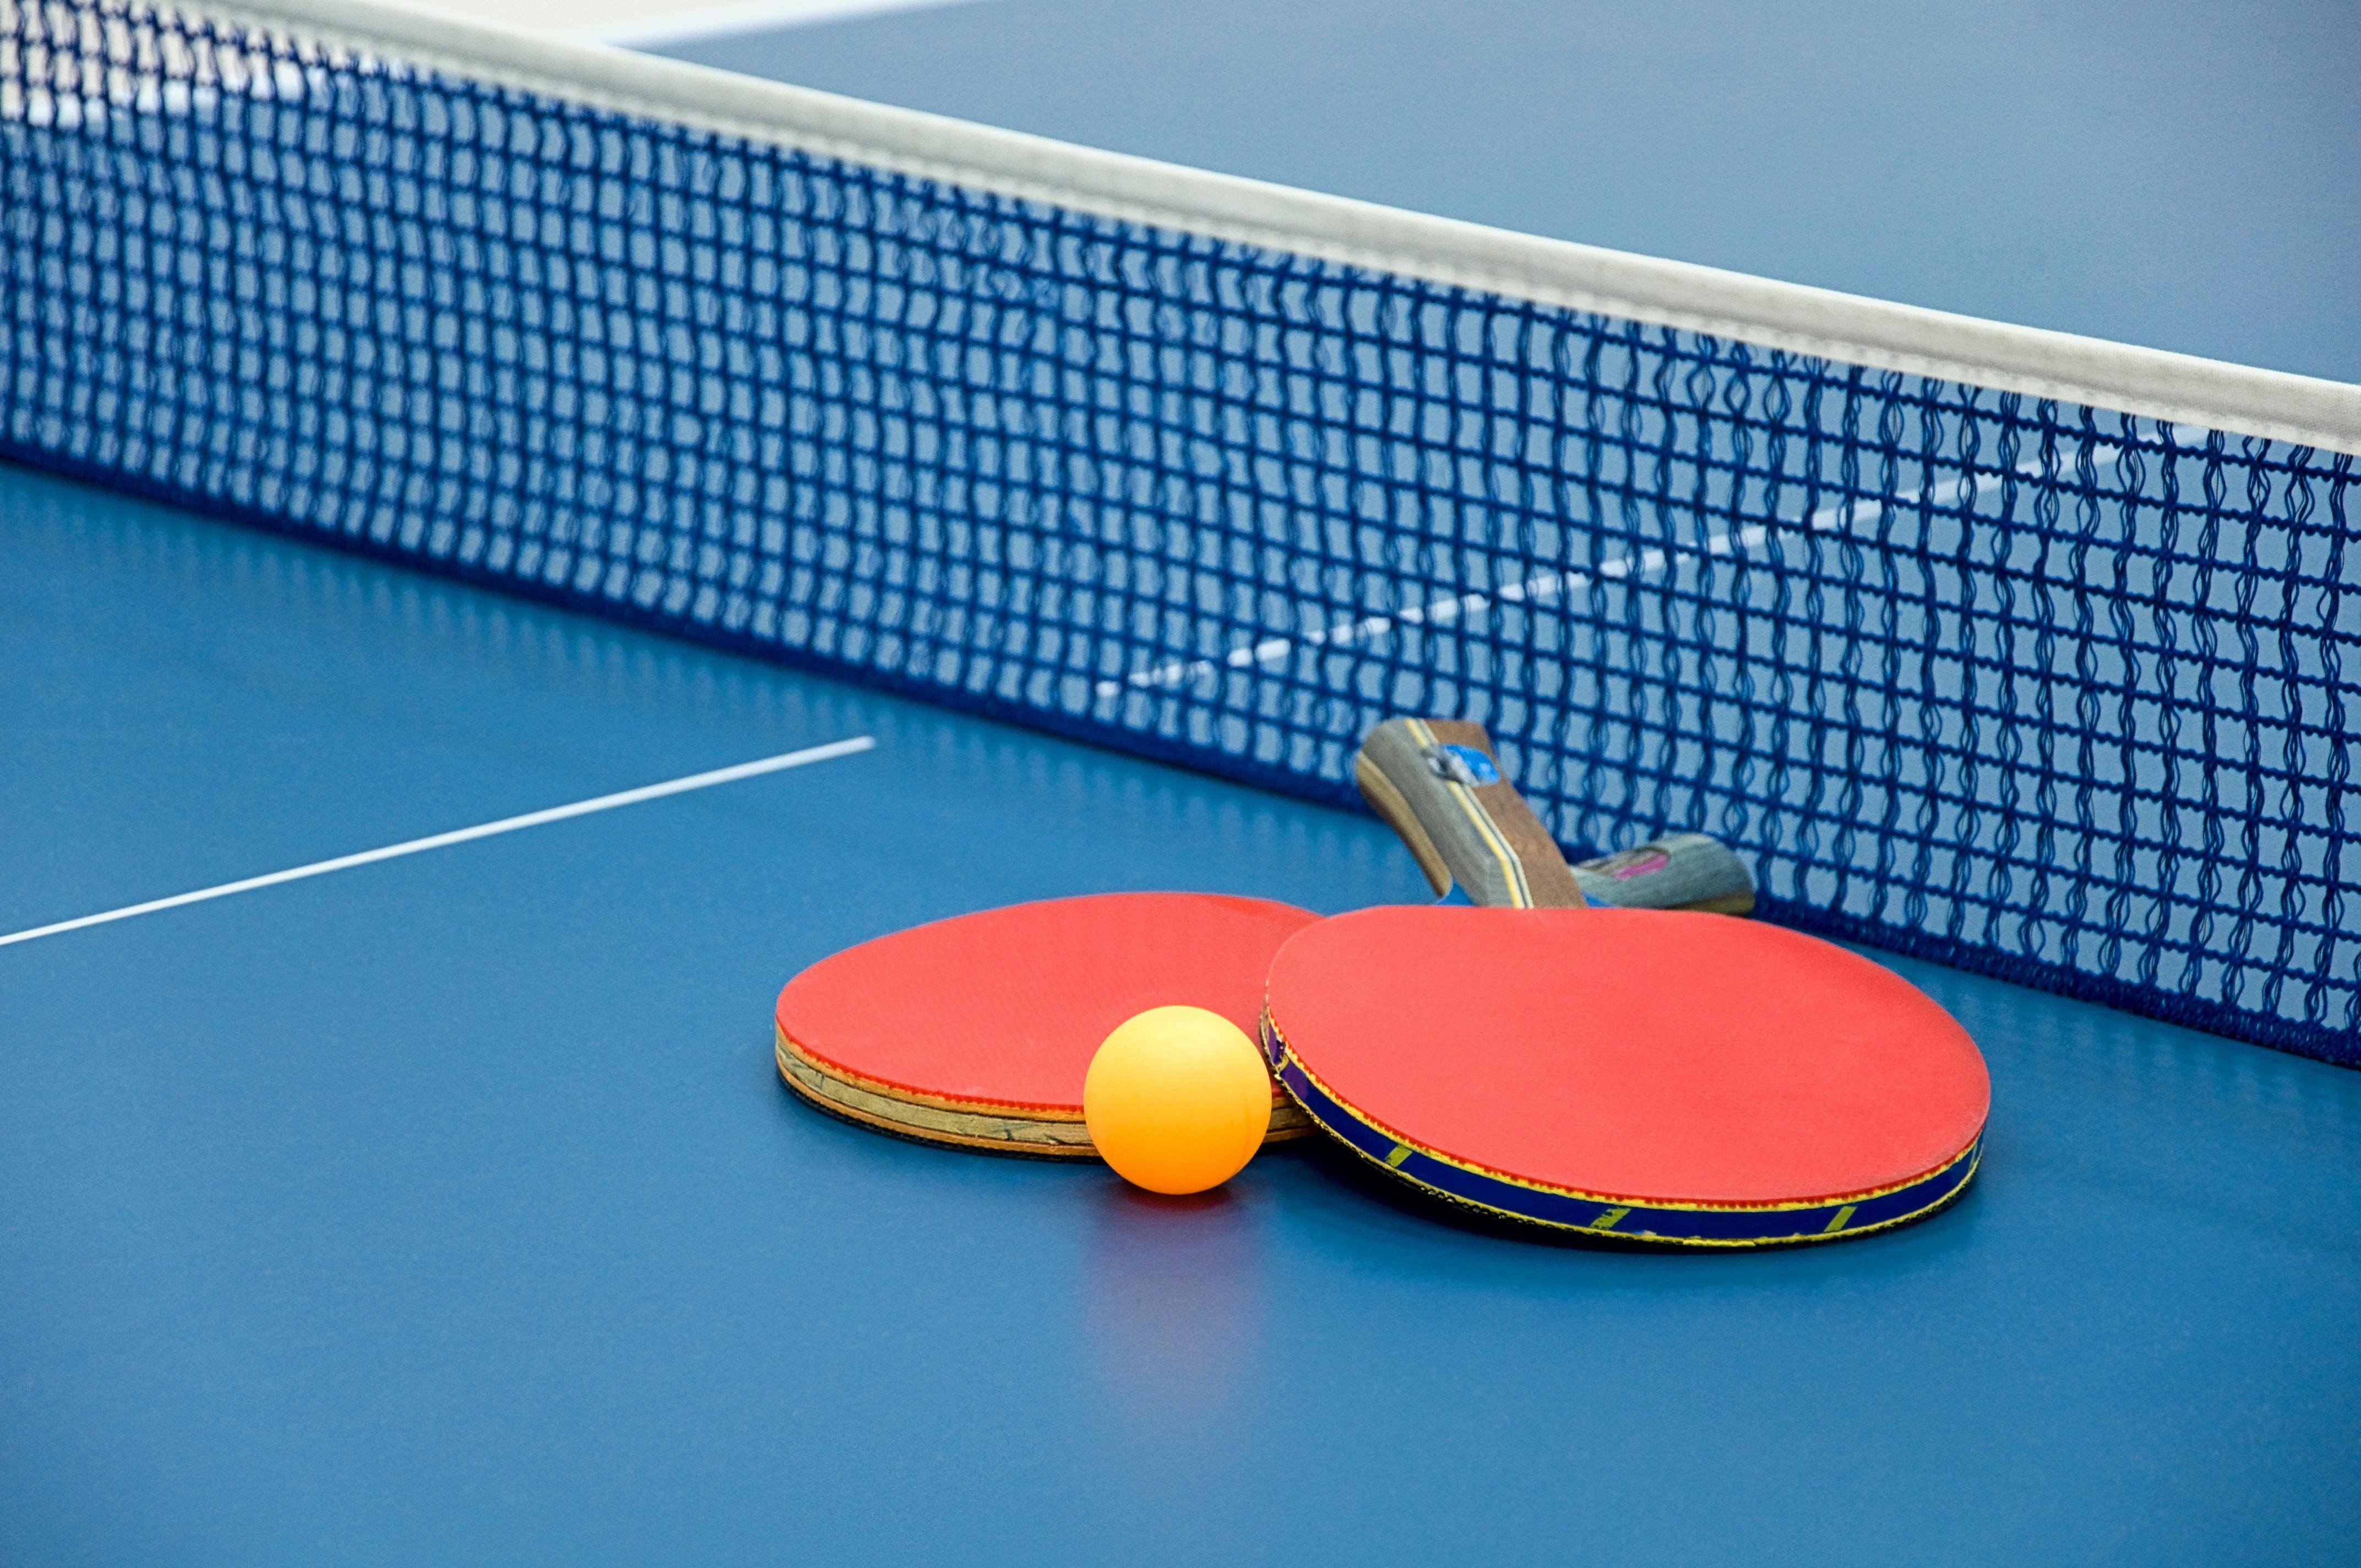 NXNW Ping Pong Tourment.